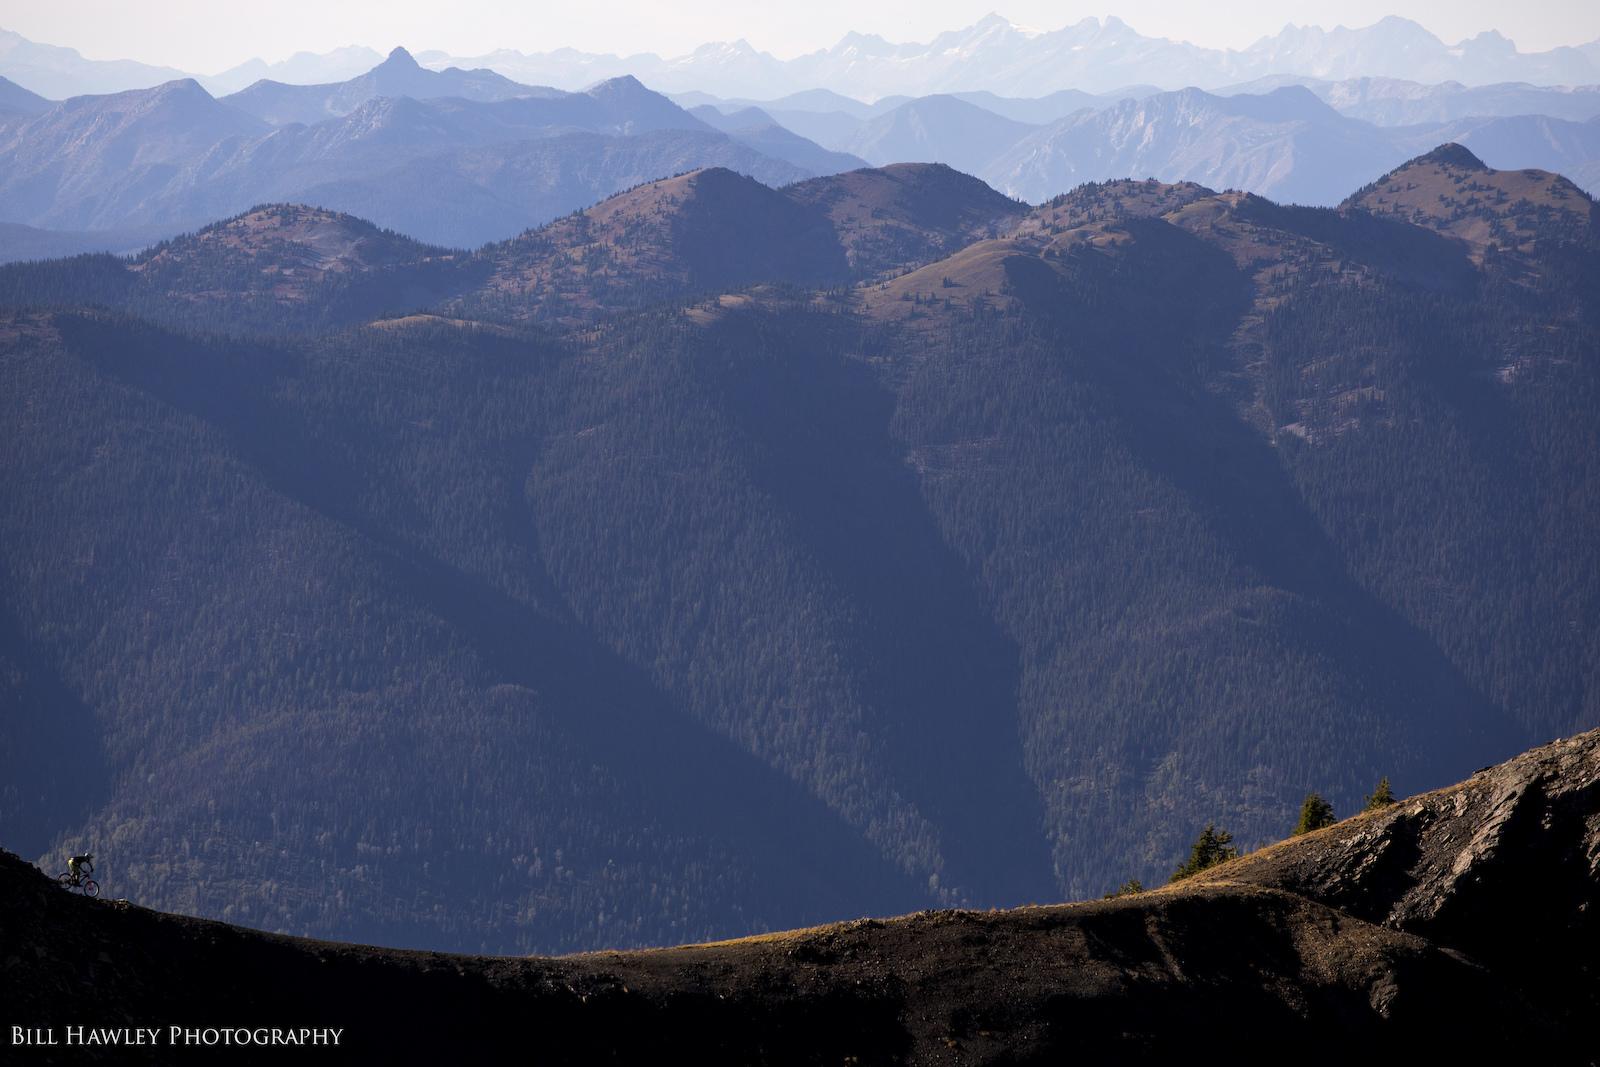 Along the ridge